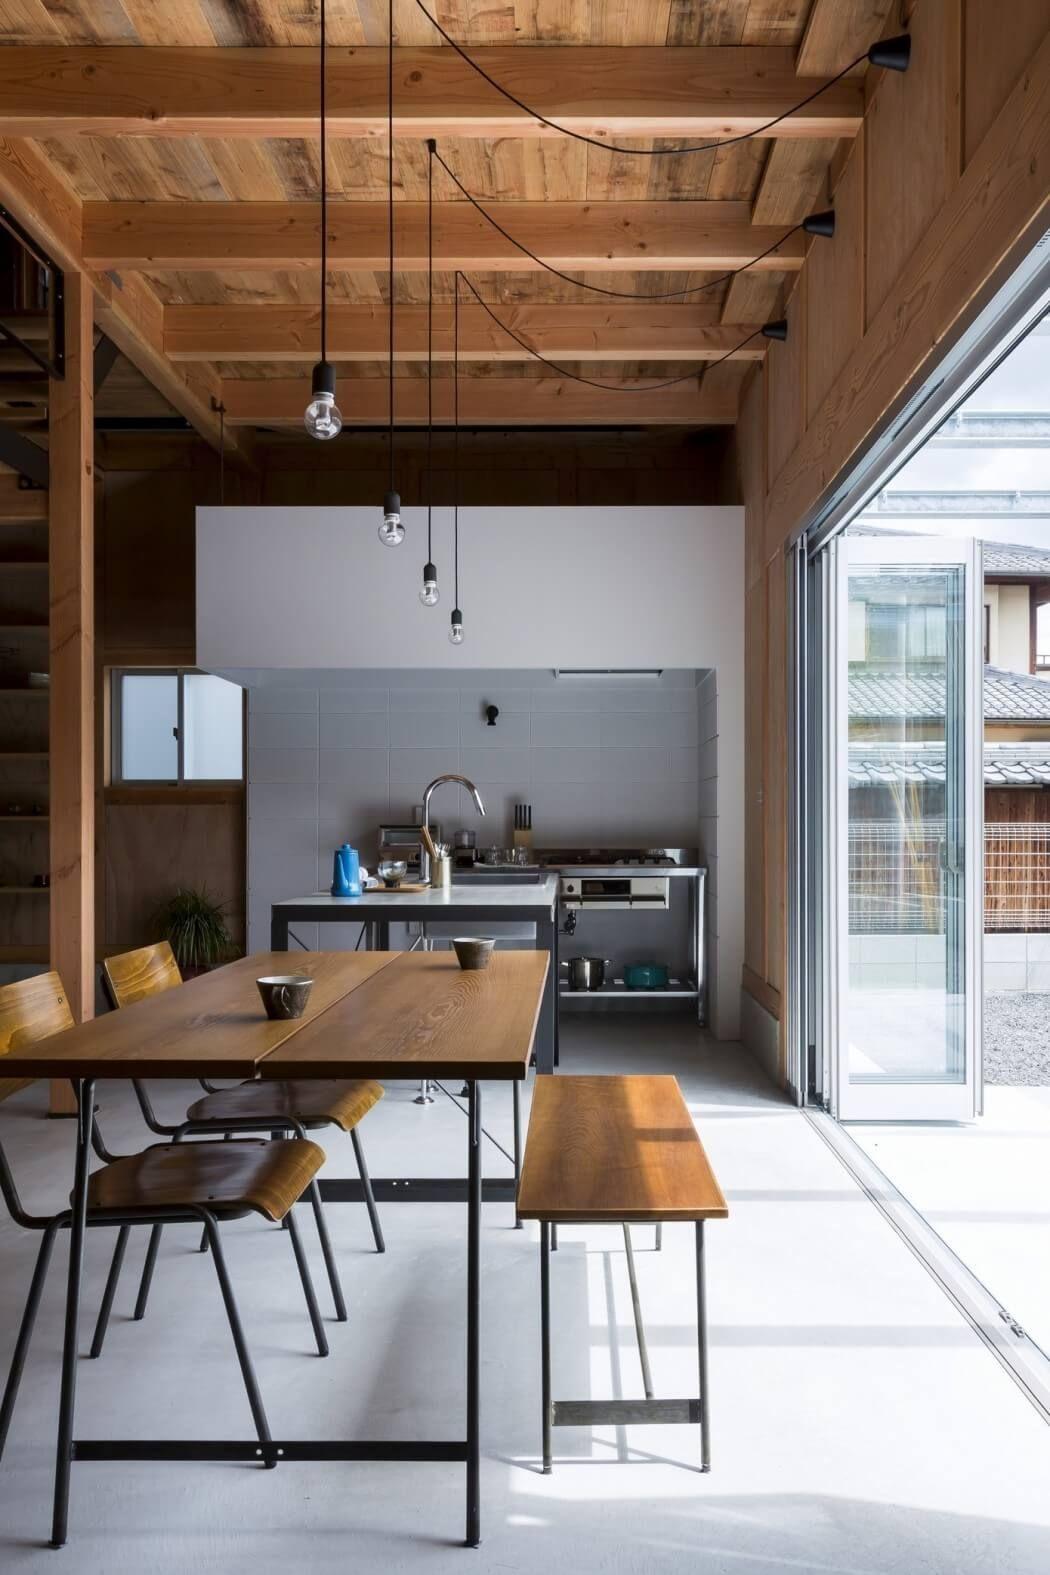 002-ishibe-house-alts-design-office-1050x1575.jpg 1050×1575 pikseliä